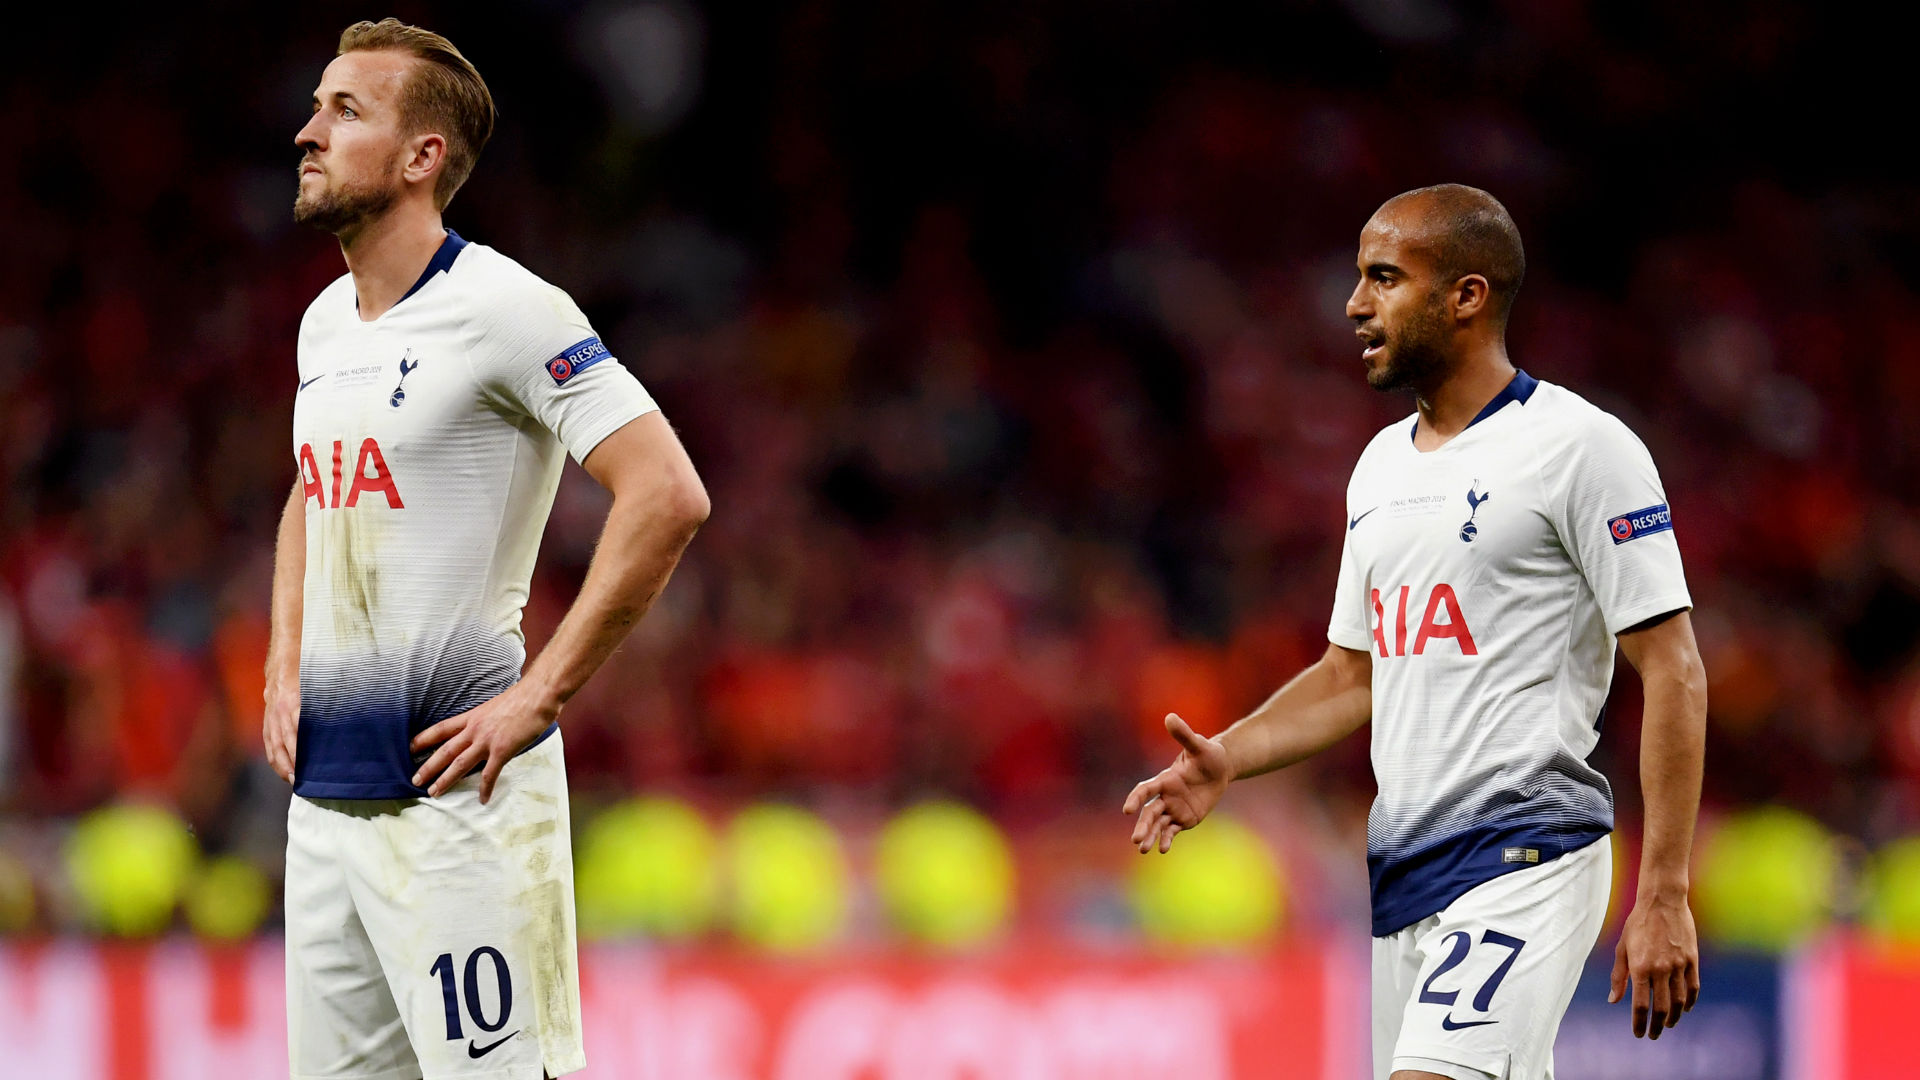 Lucas Moura Tottenham Liverpool Champions League 01 06 2019